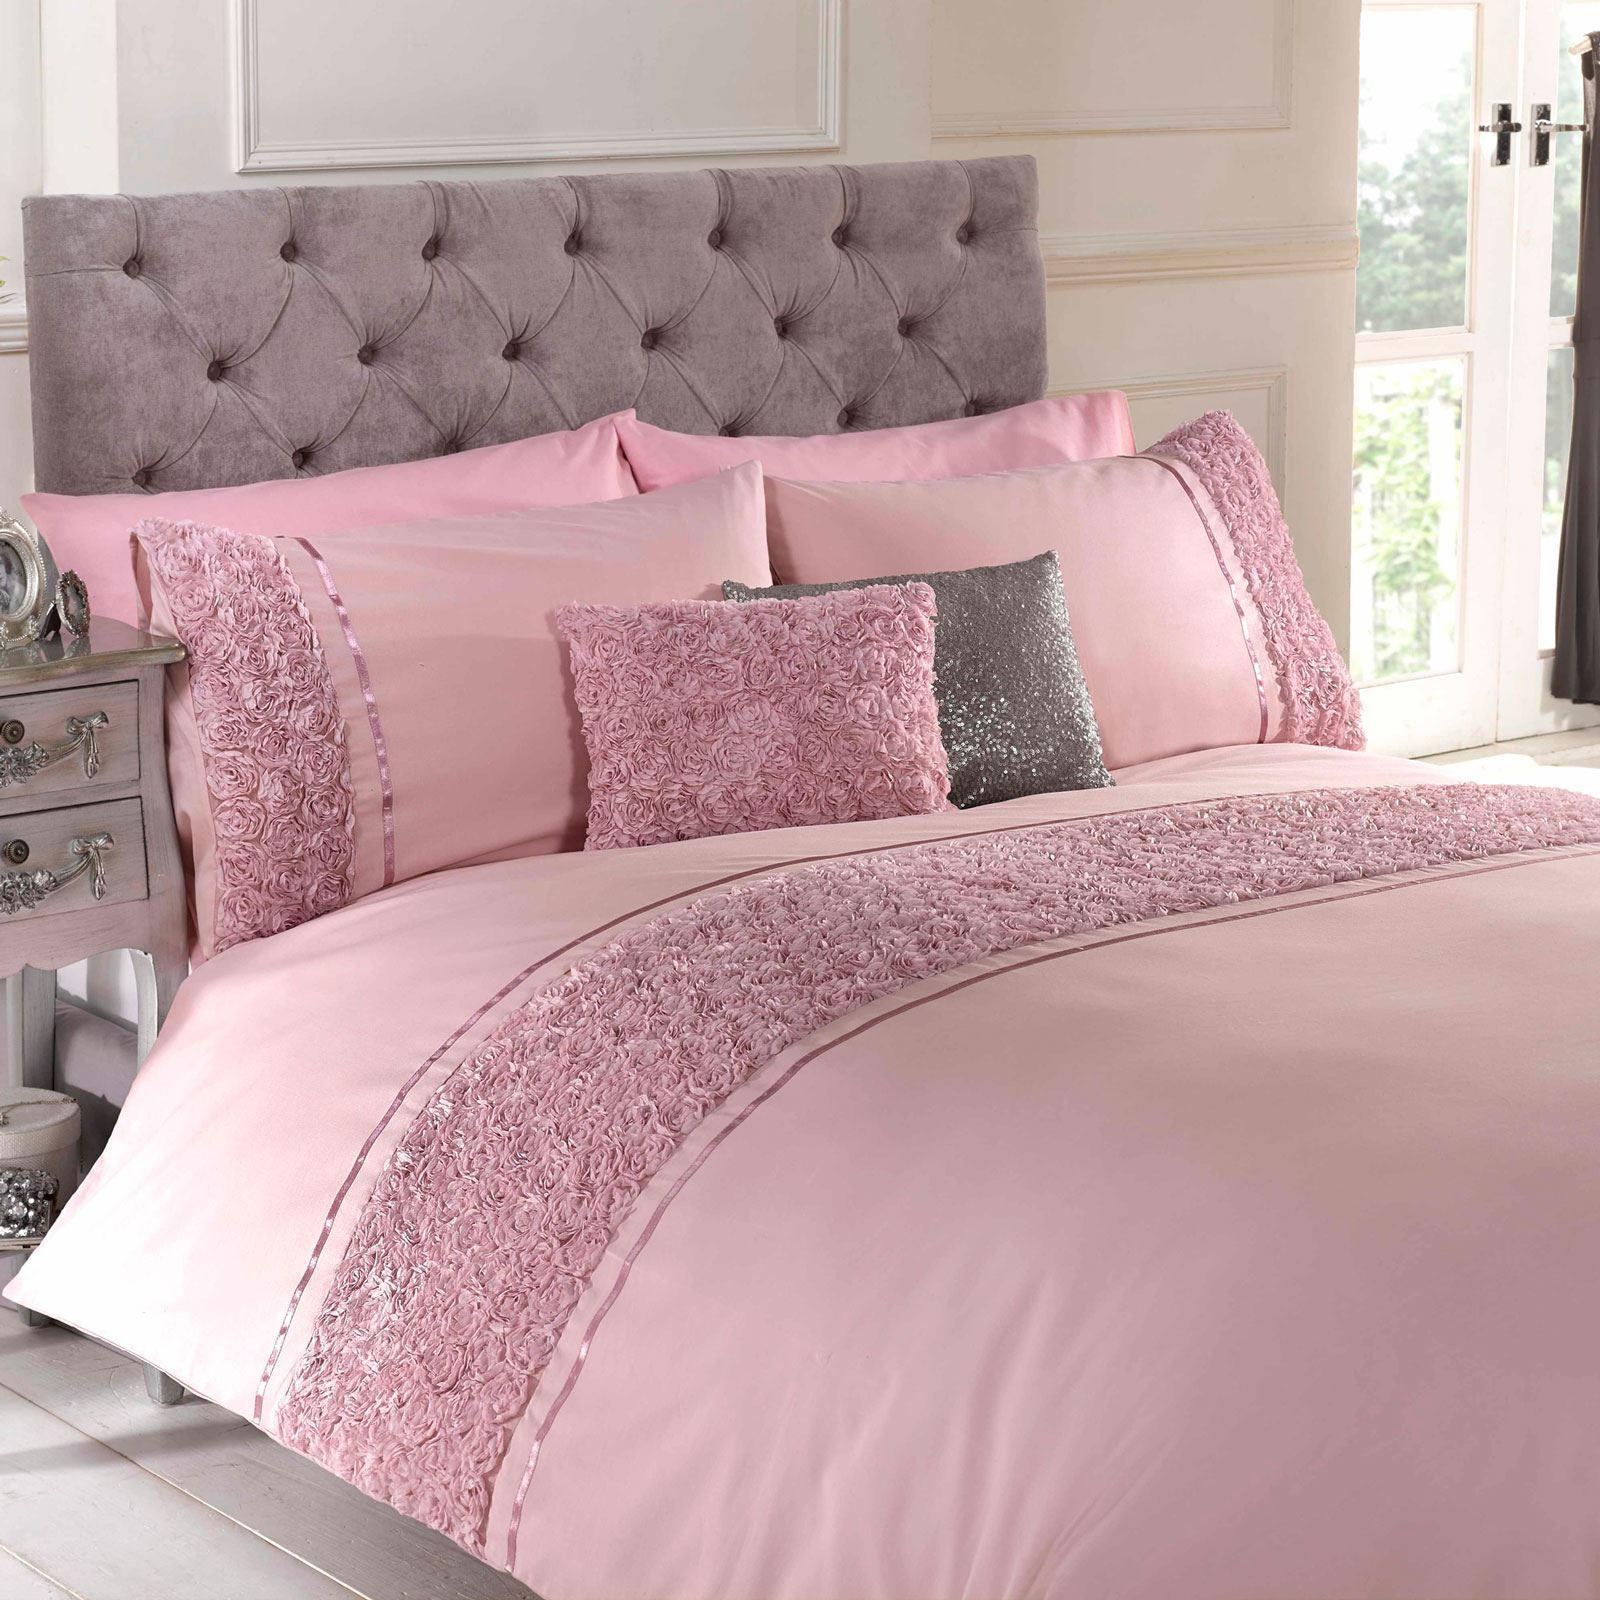 LIMOGES pink RUFFLE blueSH PINK SINGLE DUVET COVER & PILLOWCASE SET